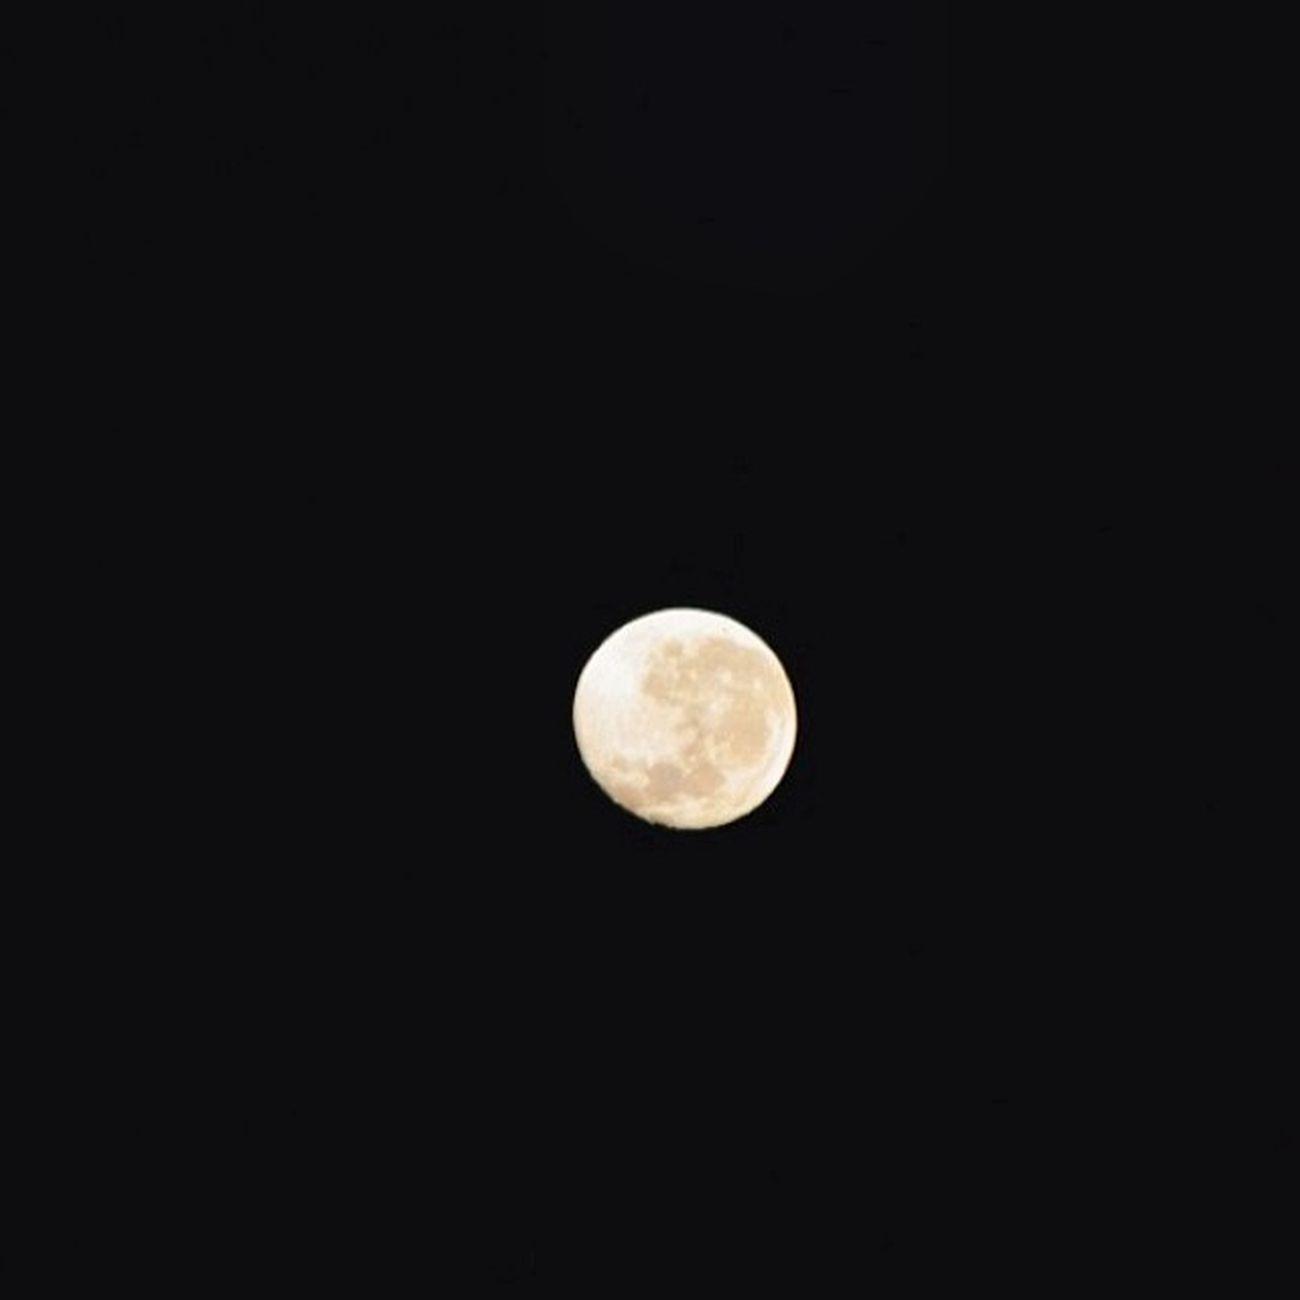 The Moon looks amazing tonight ! Sobig Almostcrashesintoanothercarlookingatit